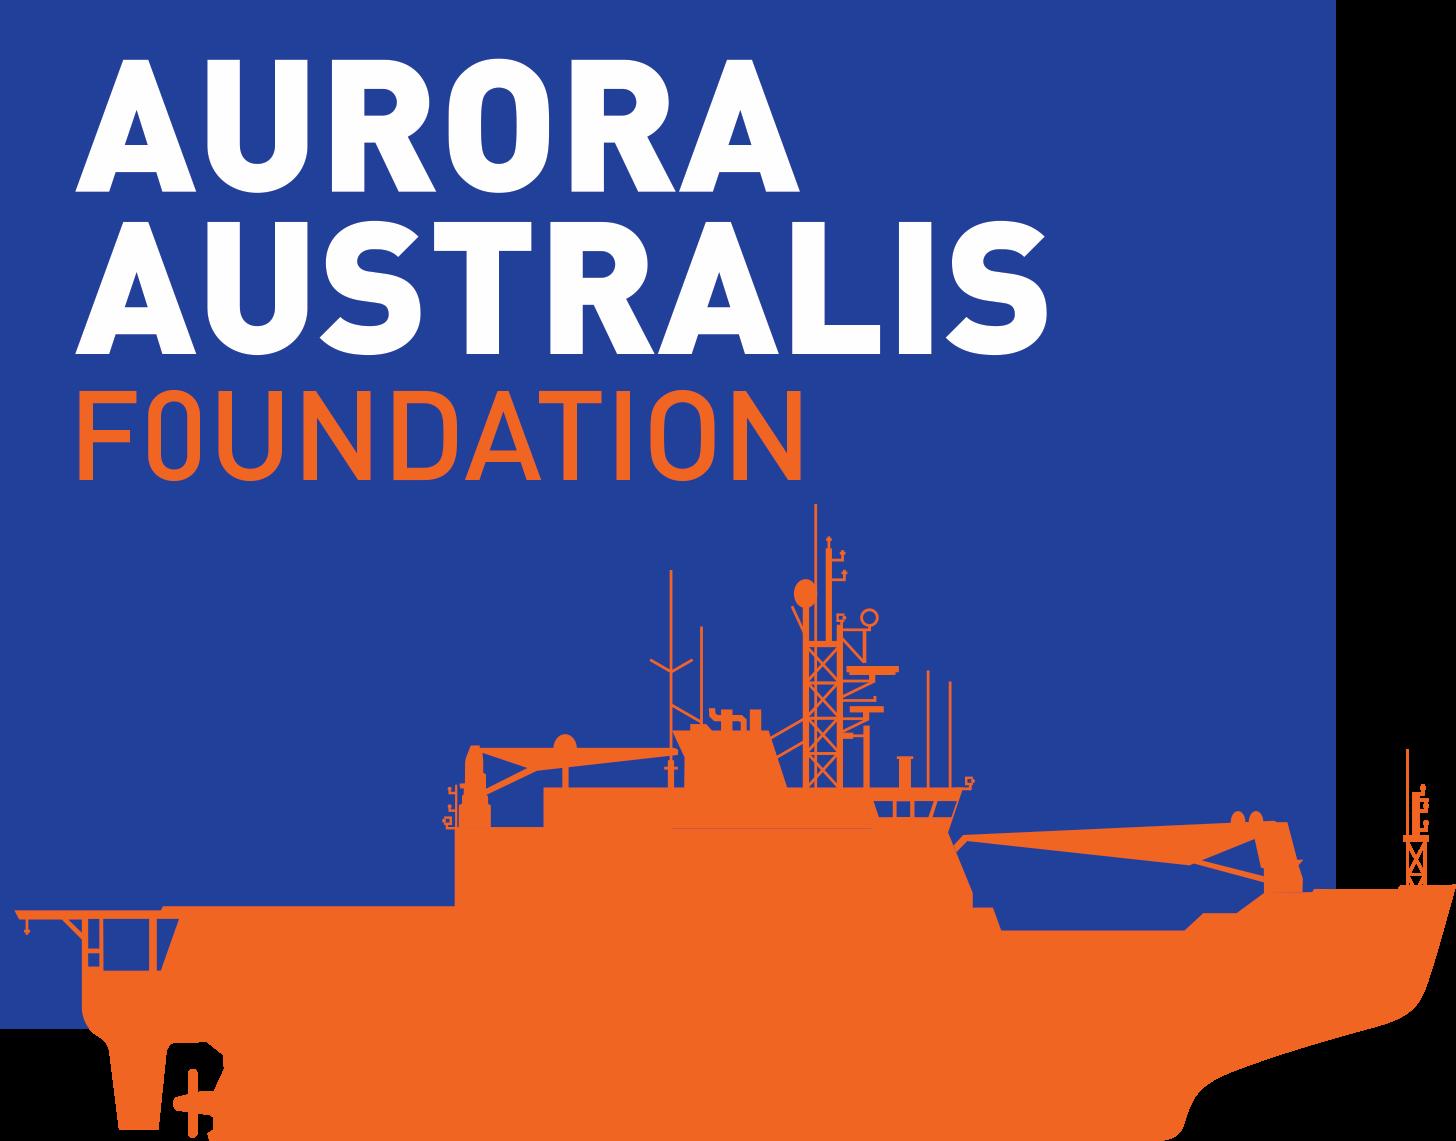 Aurora Australis Foundation